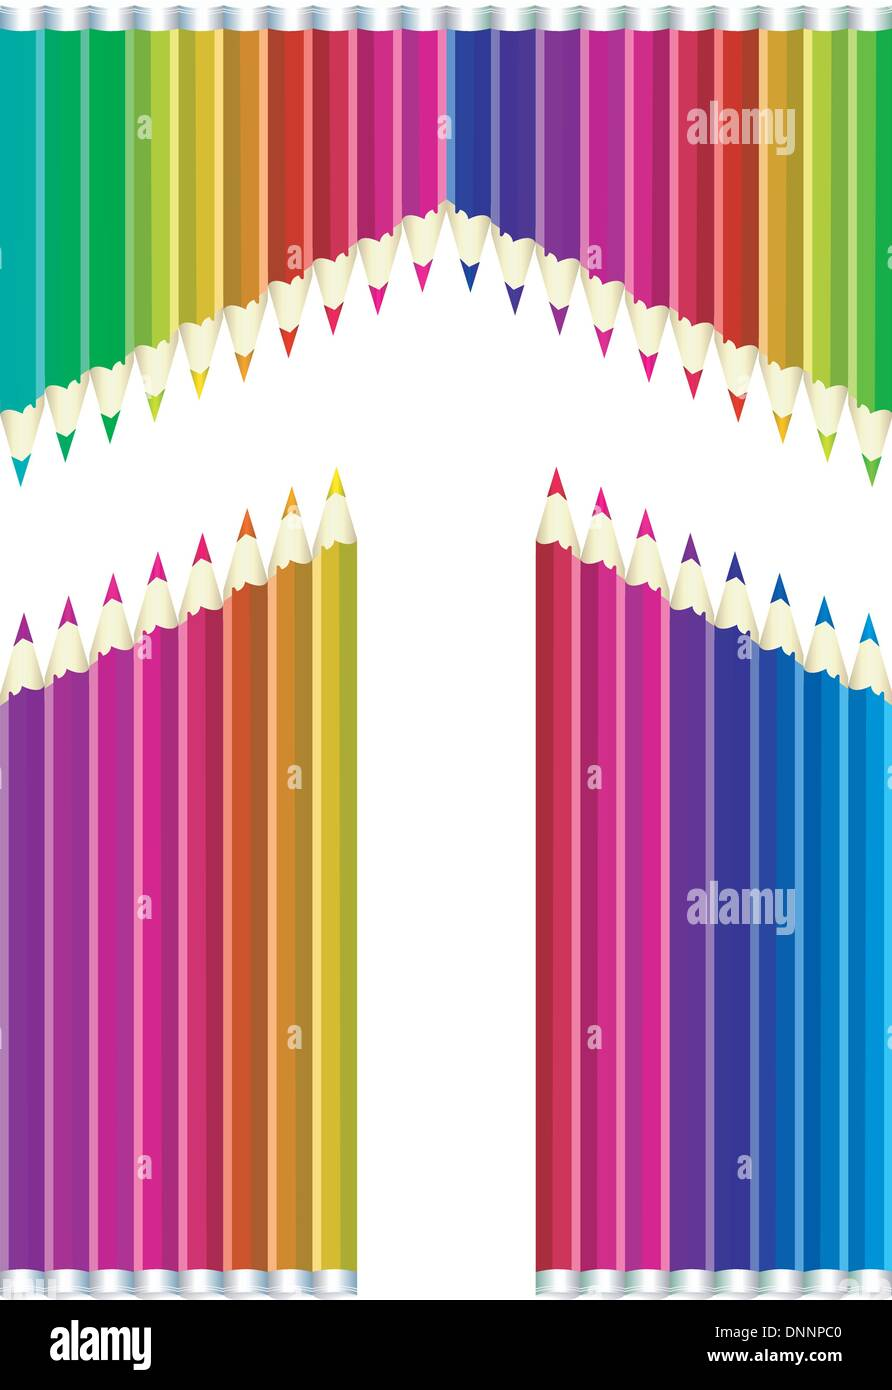 Flecha de vectorial lápices de colores sobre fondo blanco. Imagen De Stock